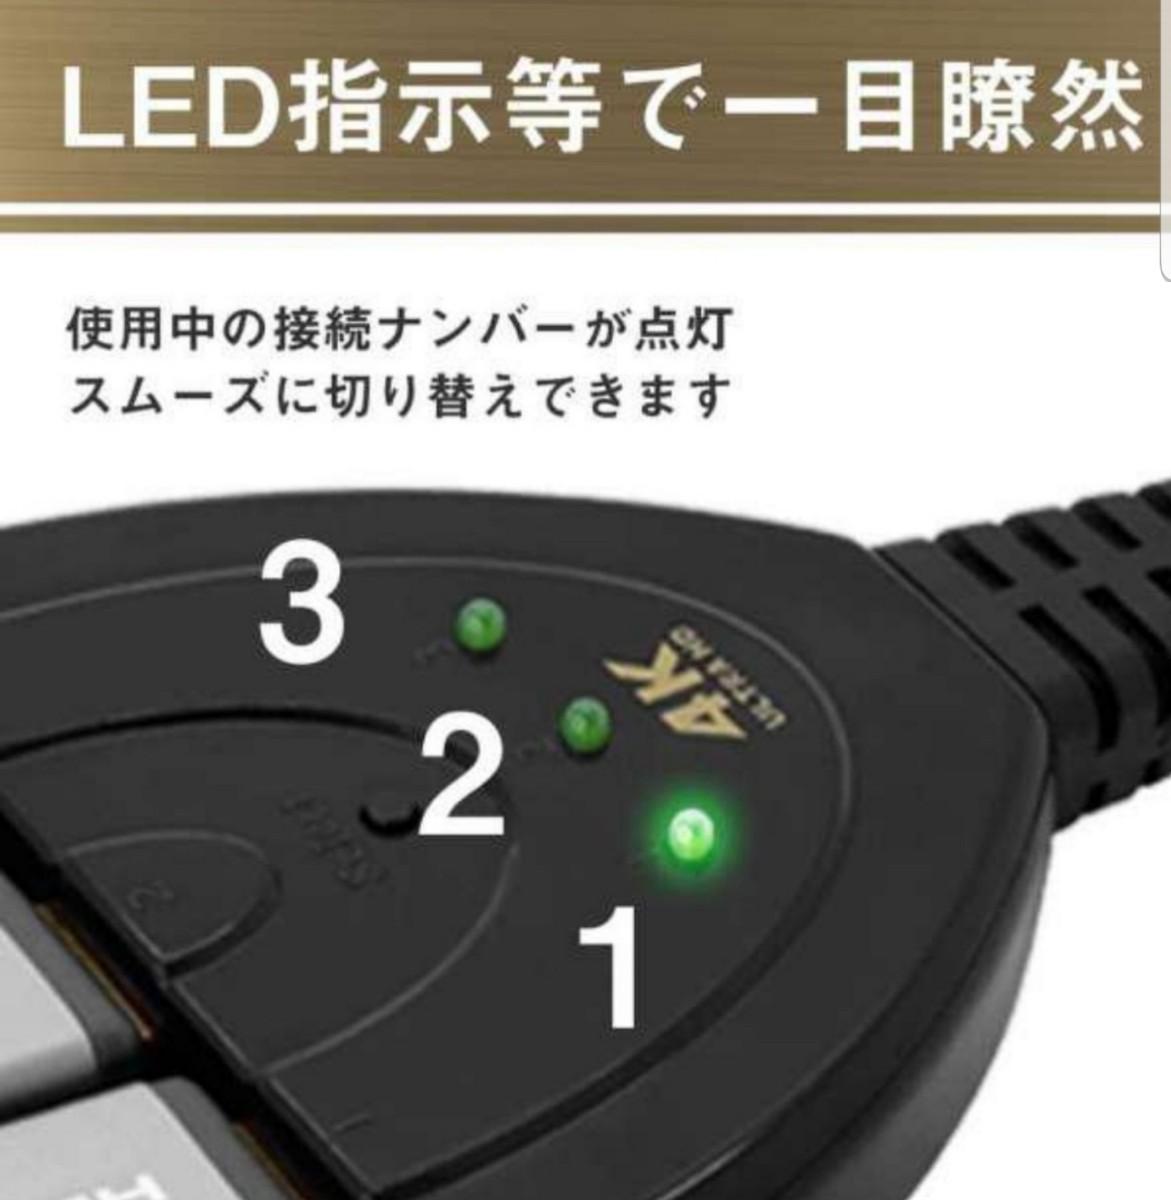 HDMI 切替器 分配器 3入力 1出力 切り替え ディスプレイ スイッチャー